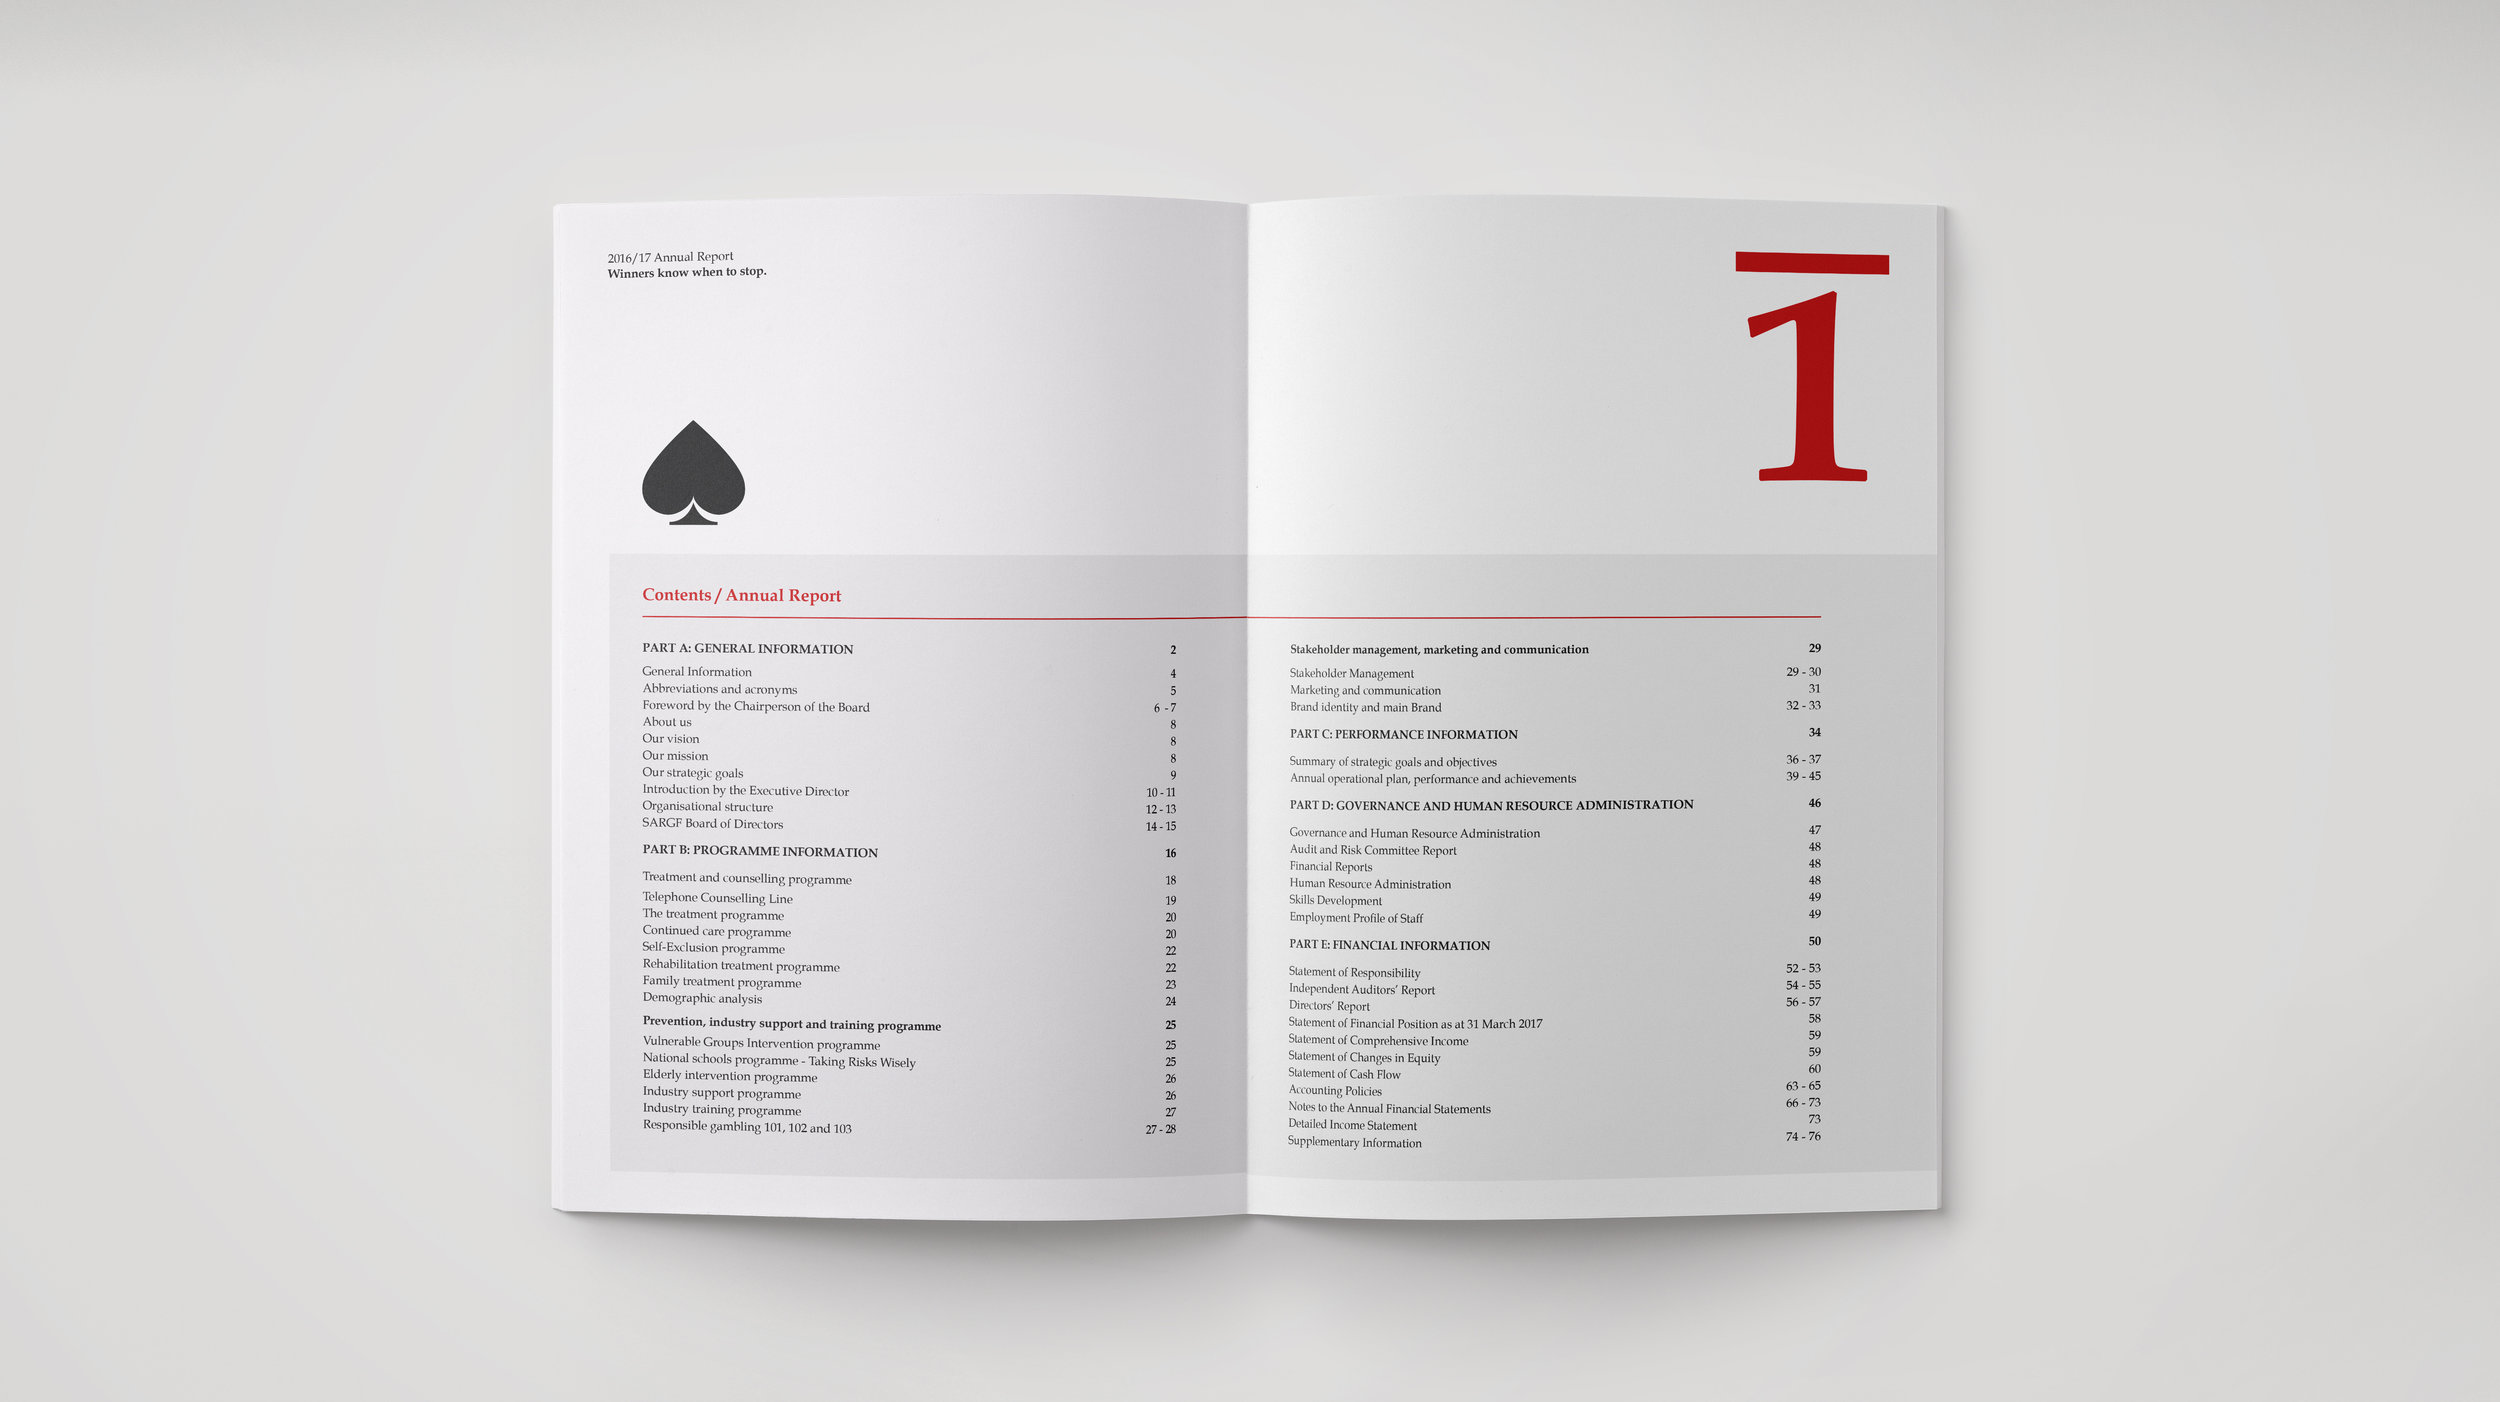 SARGF - Annual Report spread 01.jpg